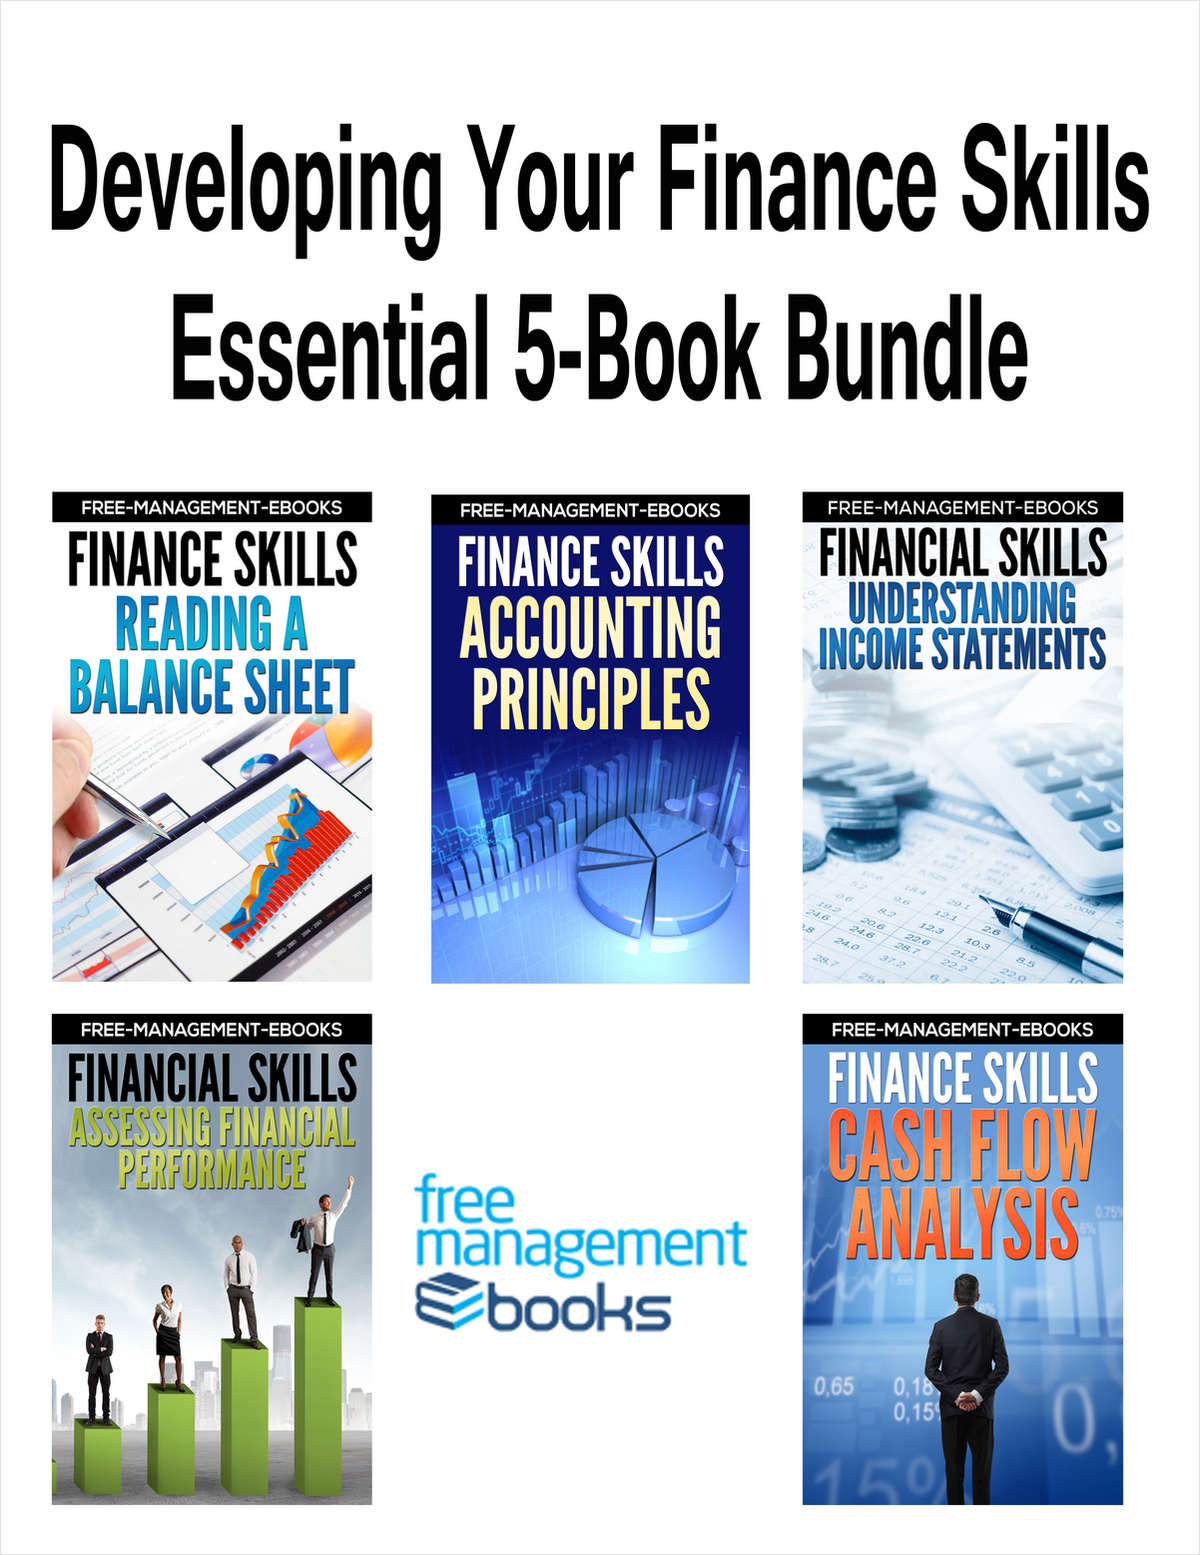 Developing Your Finance Skills - Essential 5-Book Bundle Screenshot